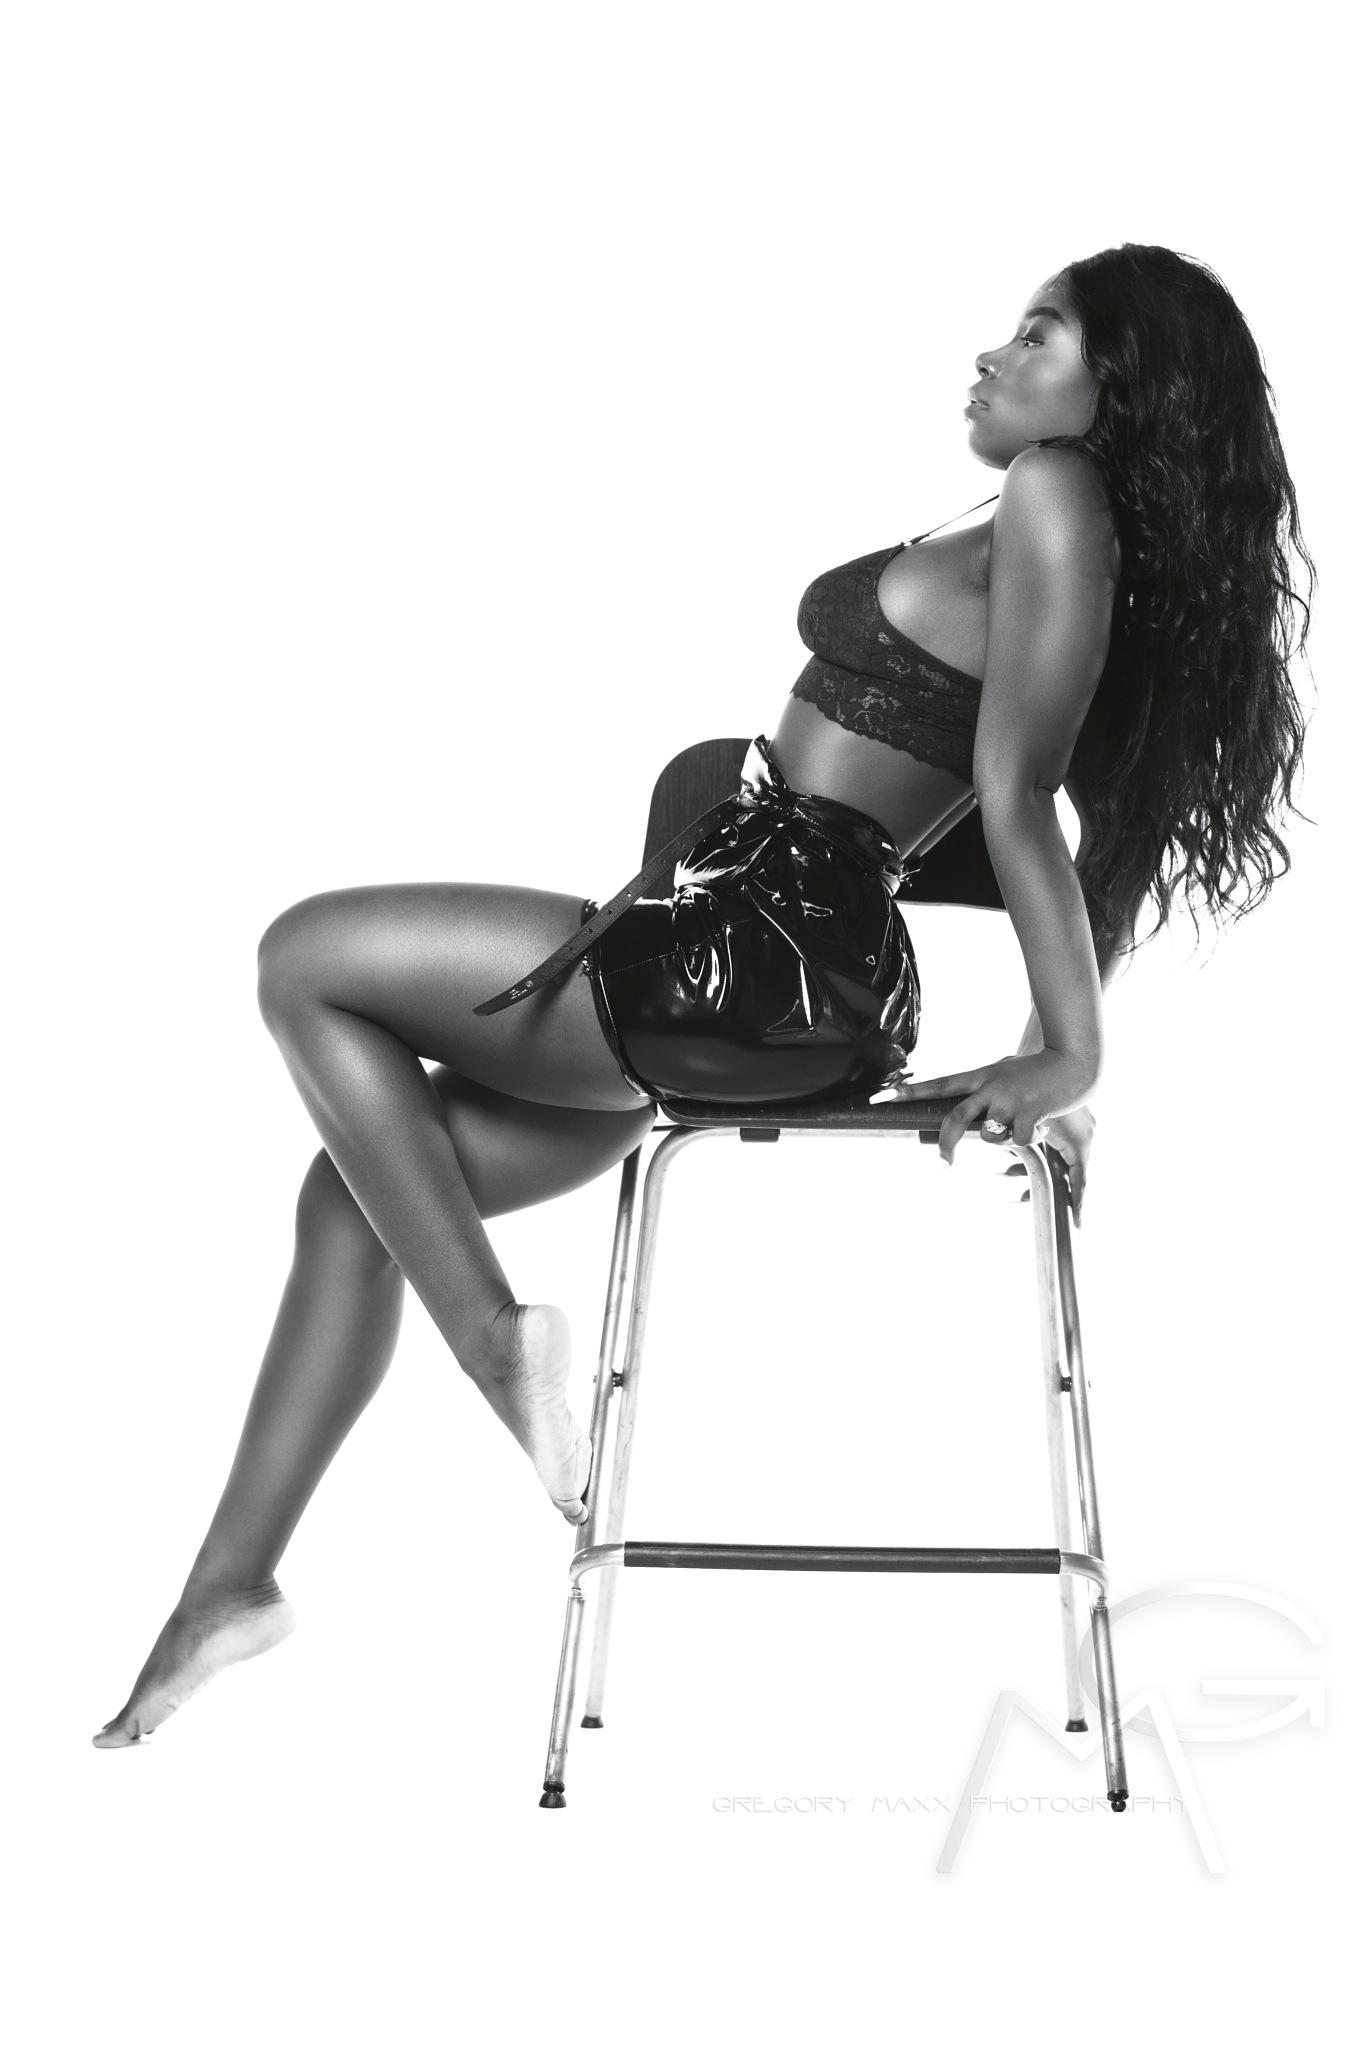 Photo in Fashion #model #hotone #b&w #sexy